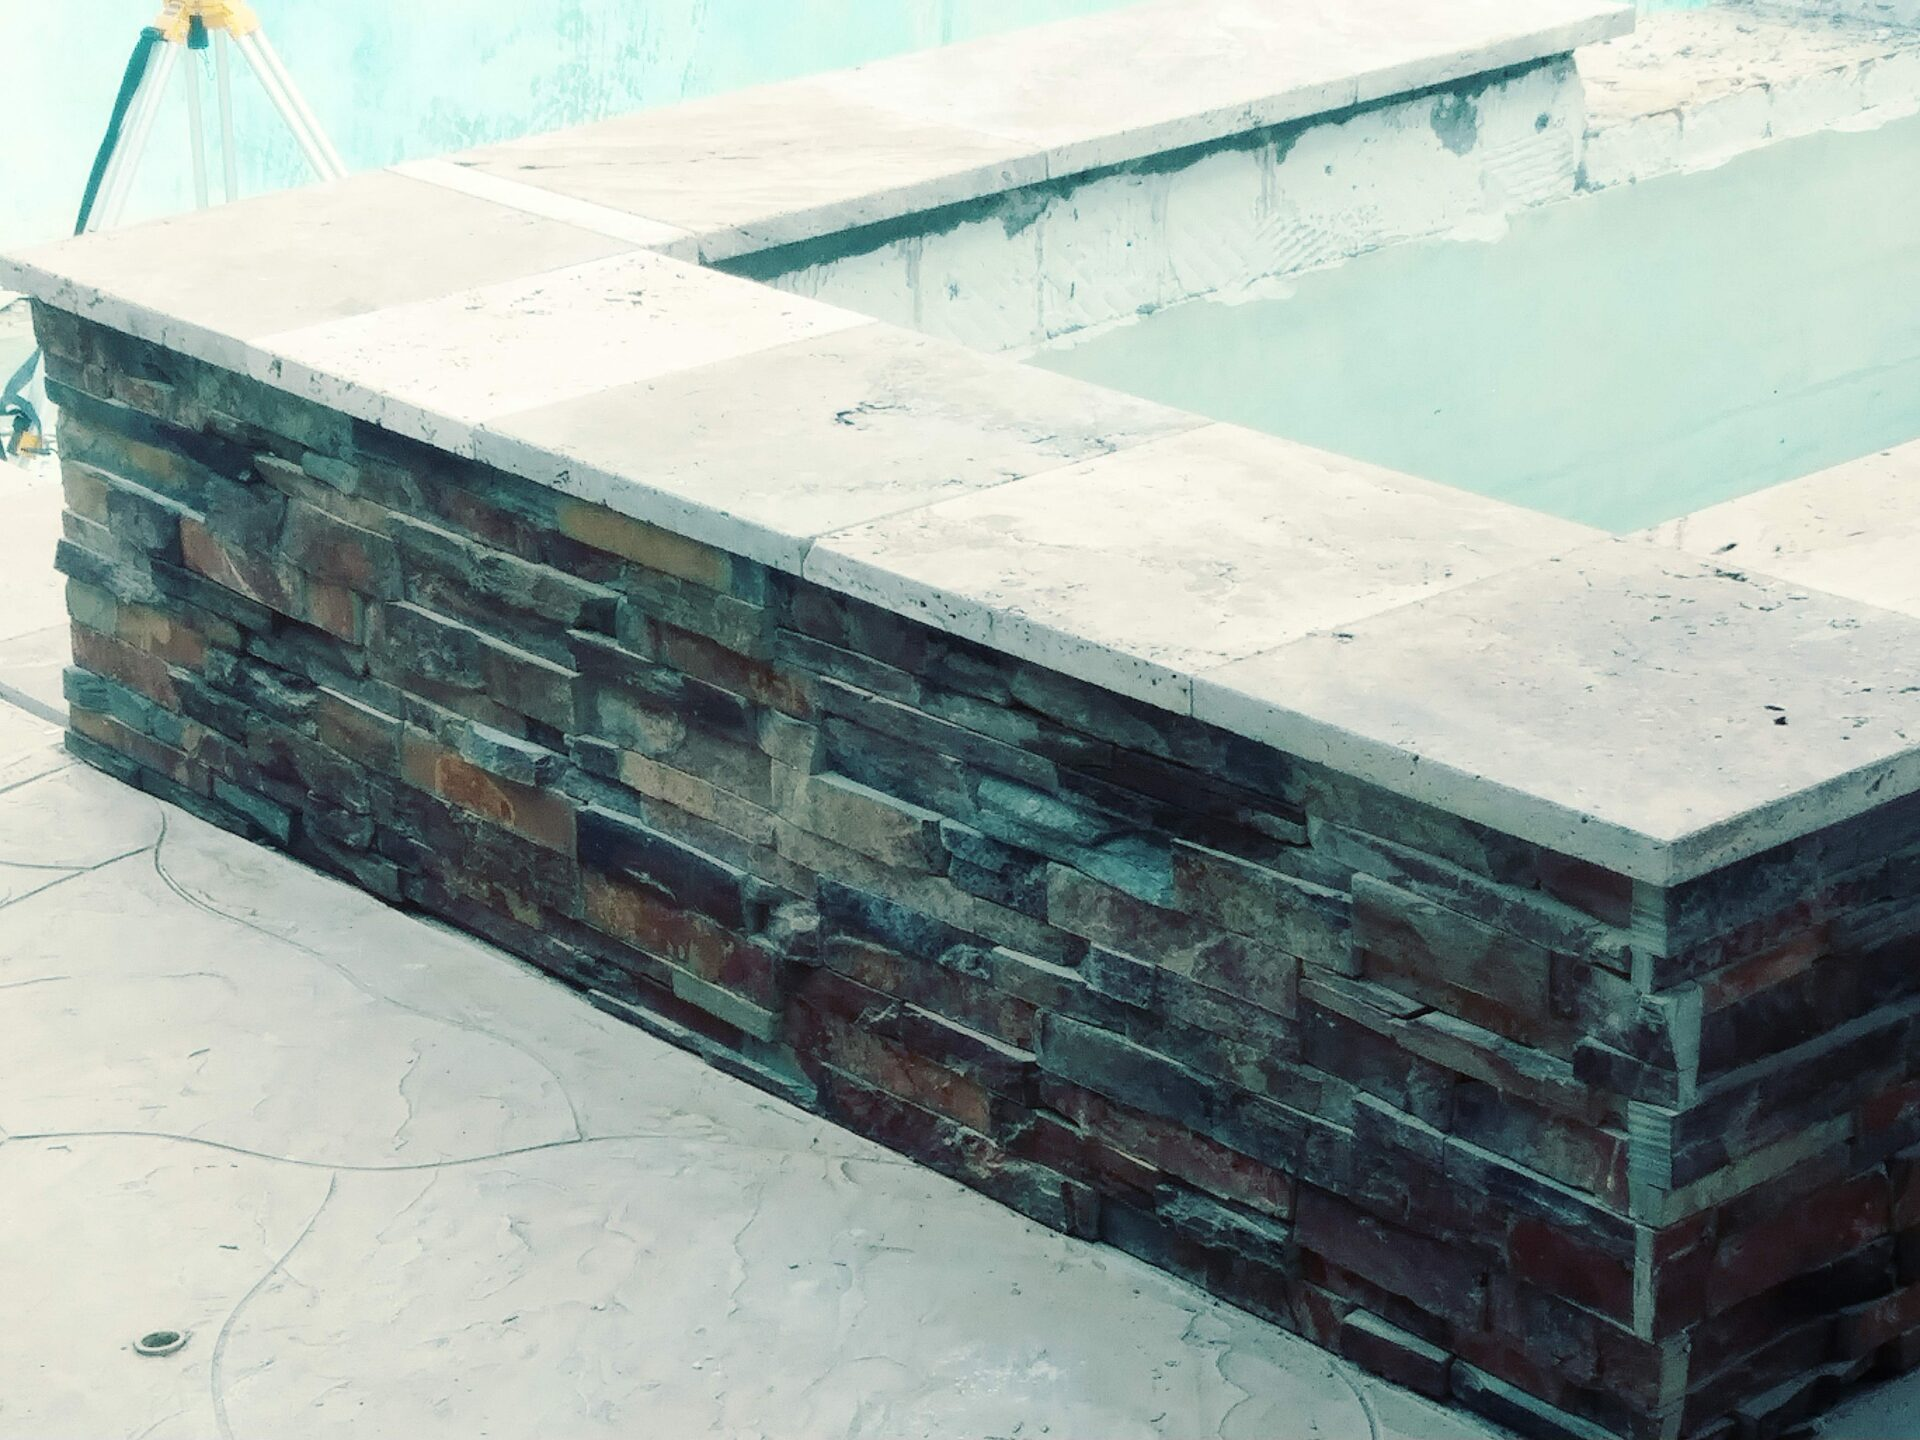 Pool Remodel - Katy - After Image008